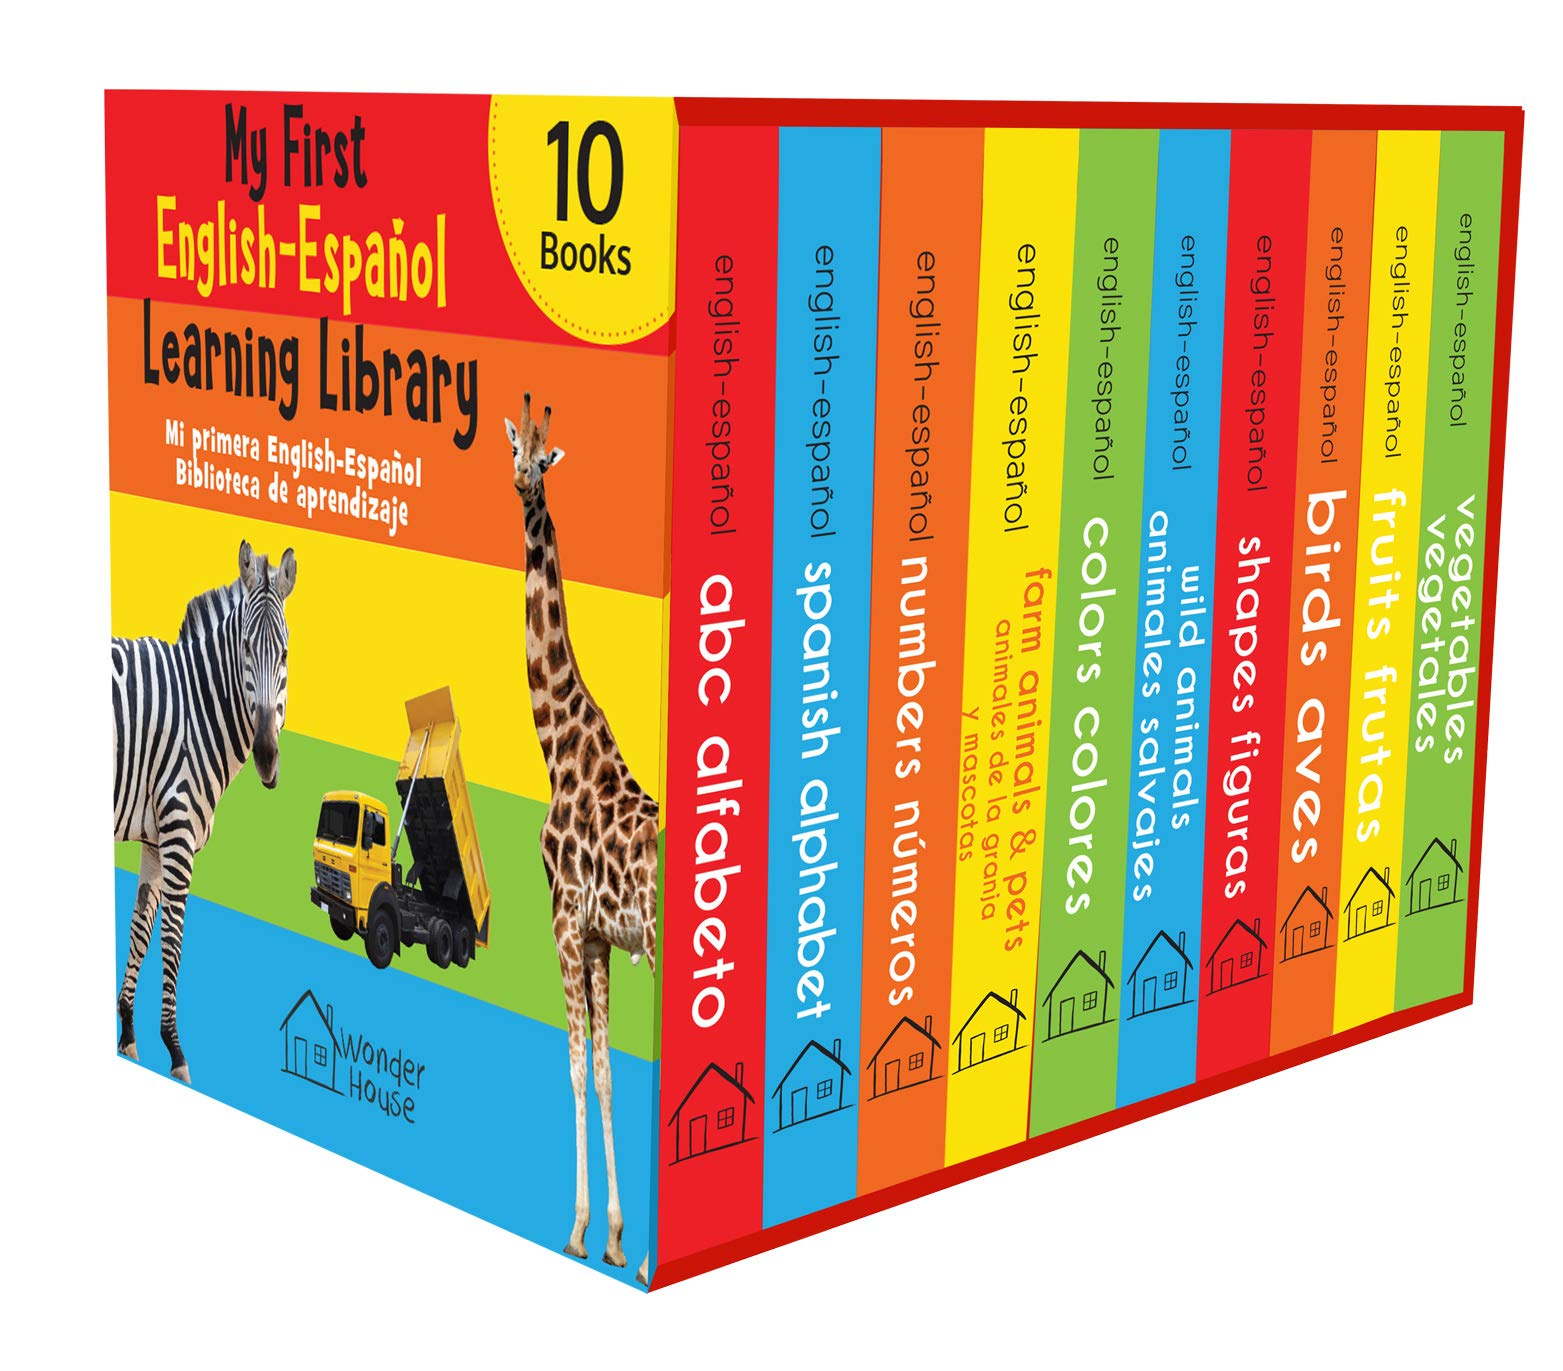 My First English – Español Learning Library (Mi Primea English – Español Learning Library) : Boxset of 10 English – Spanish Board Books